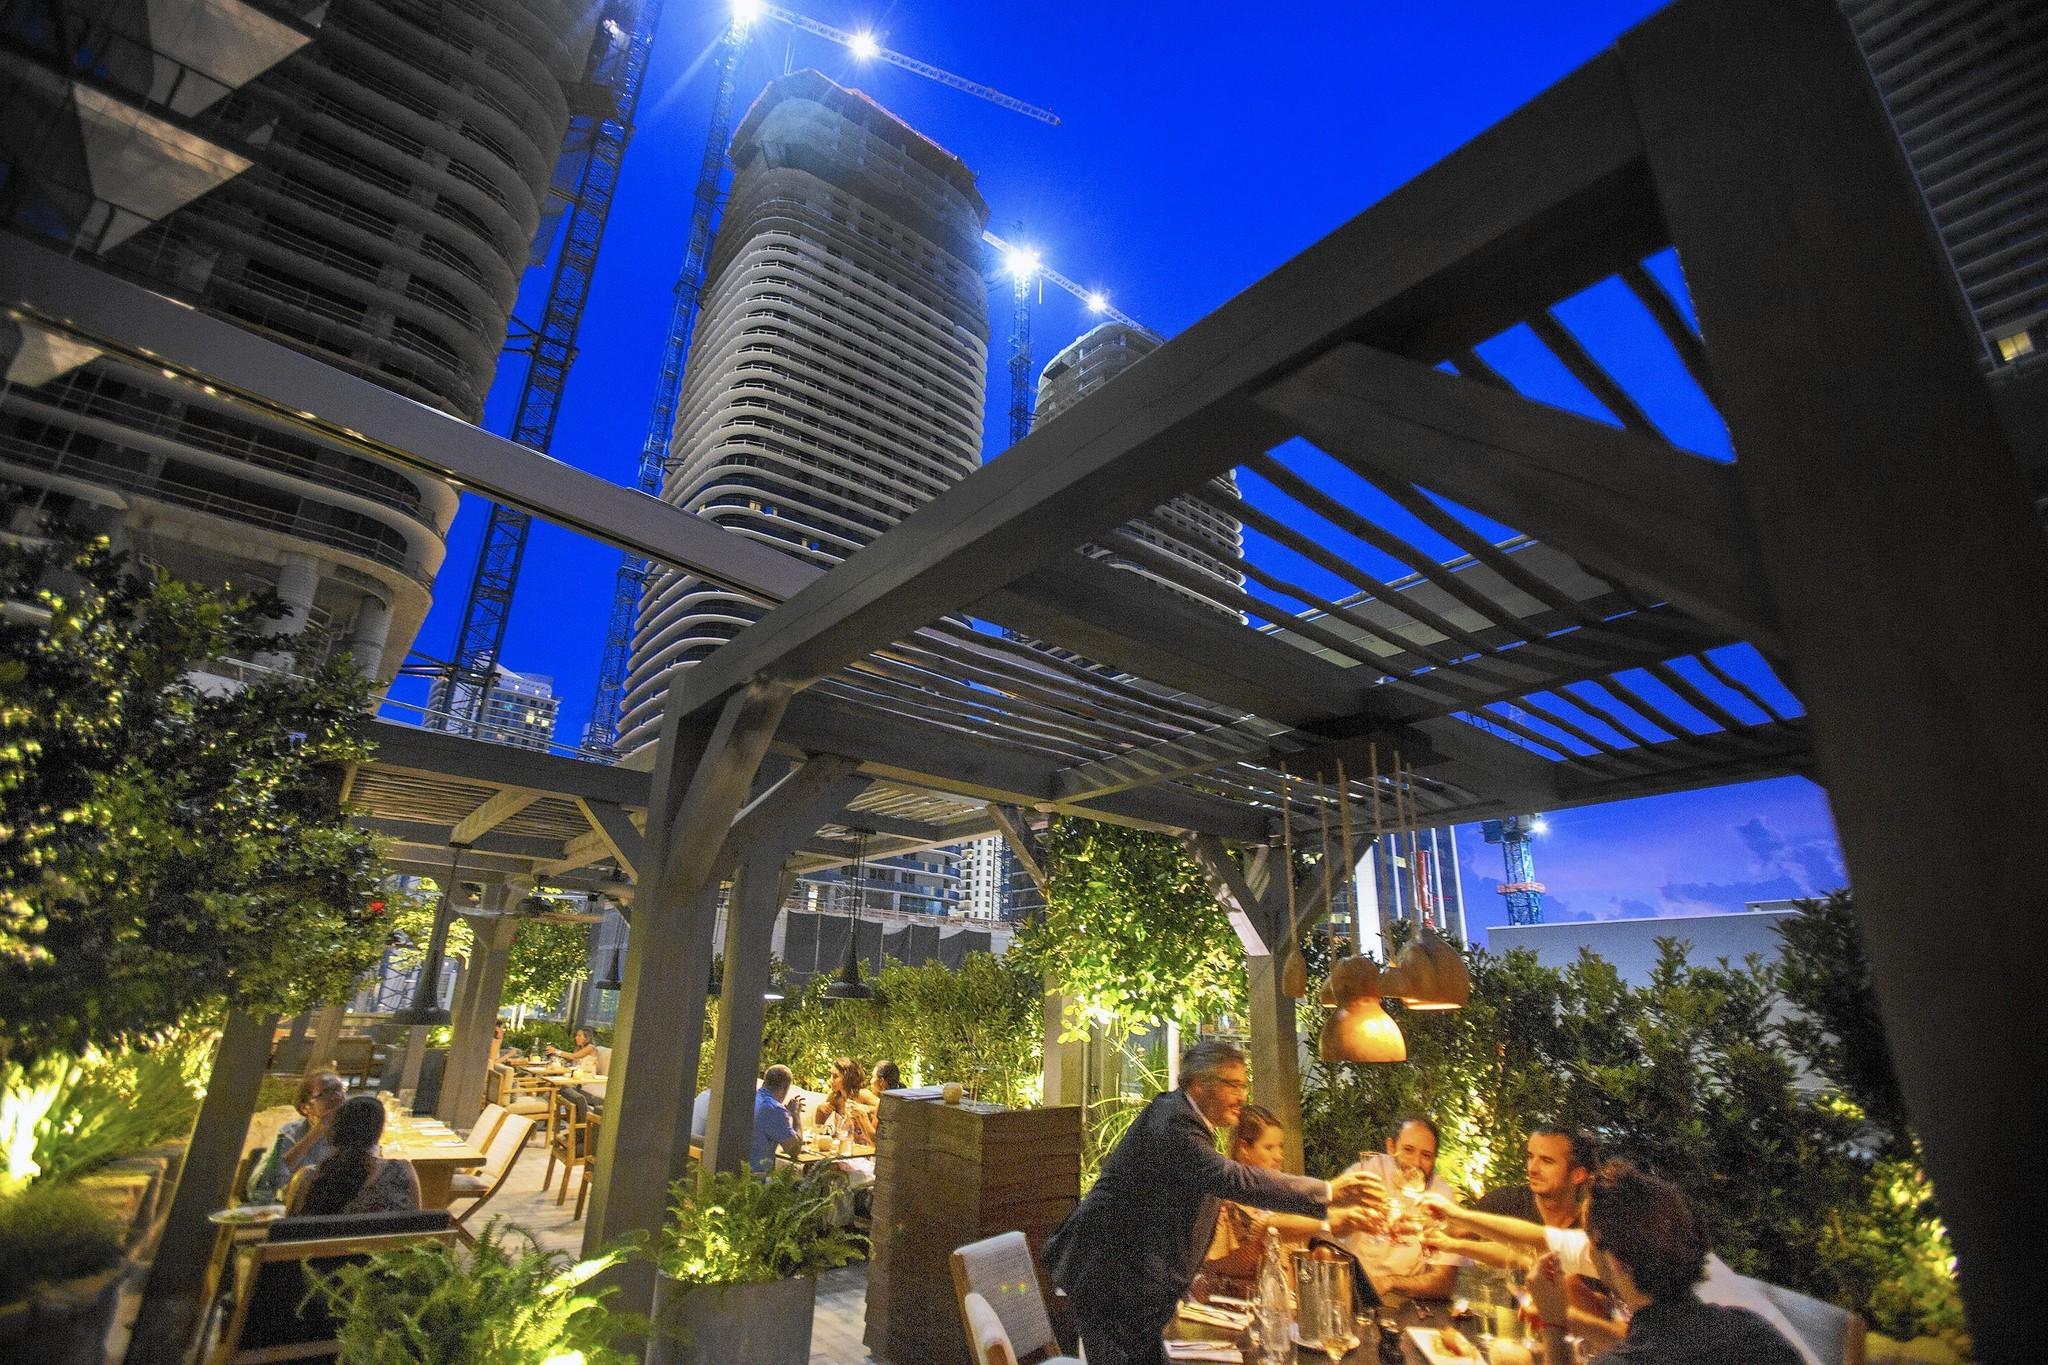 Uruguayan restaurant now in Miami  southfloridacom